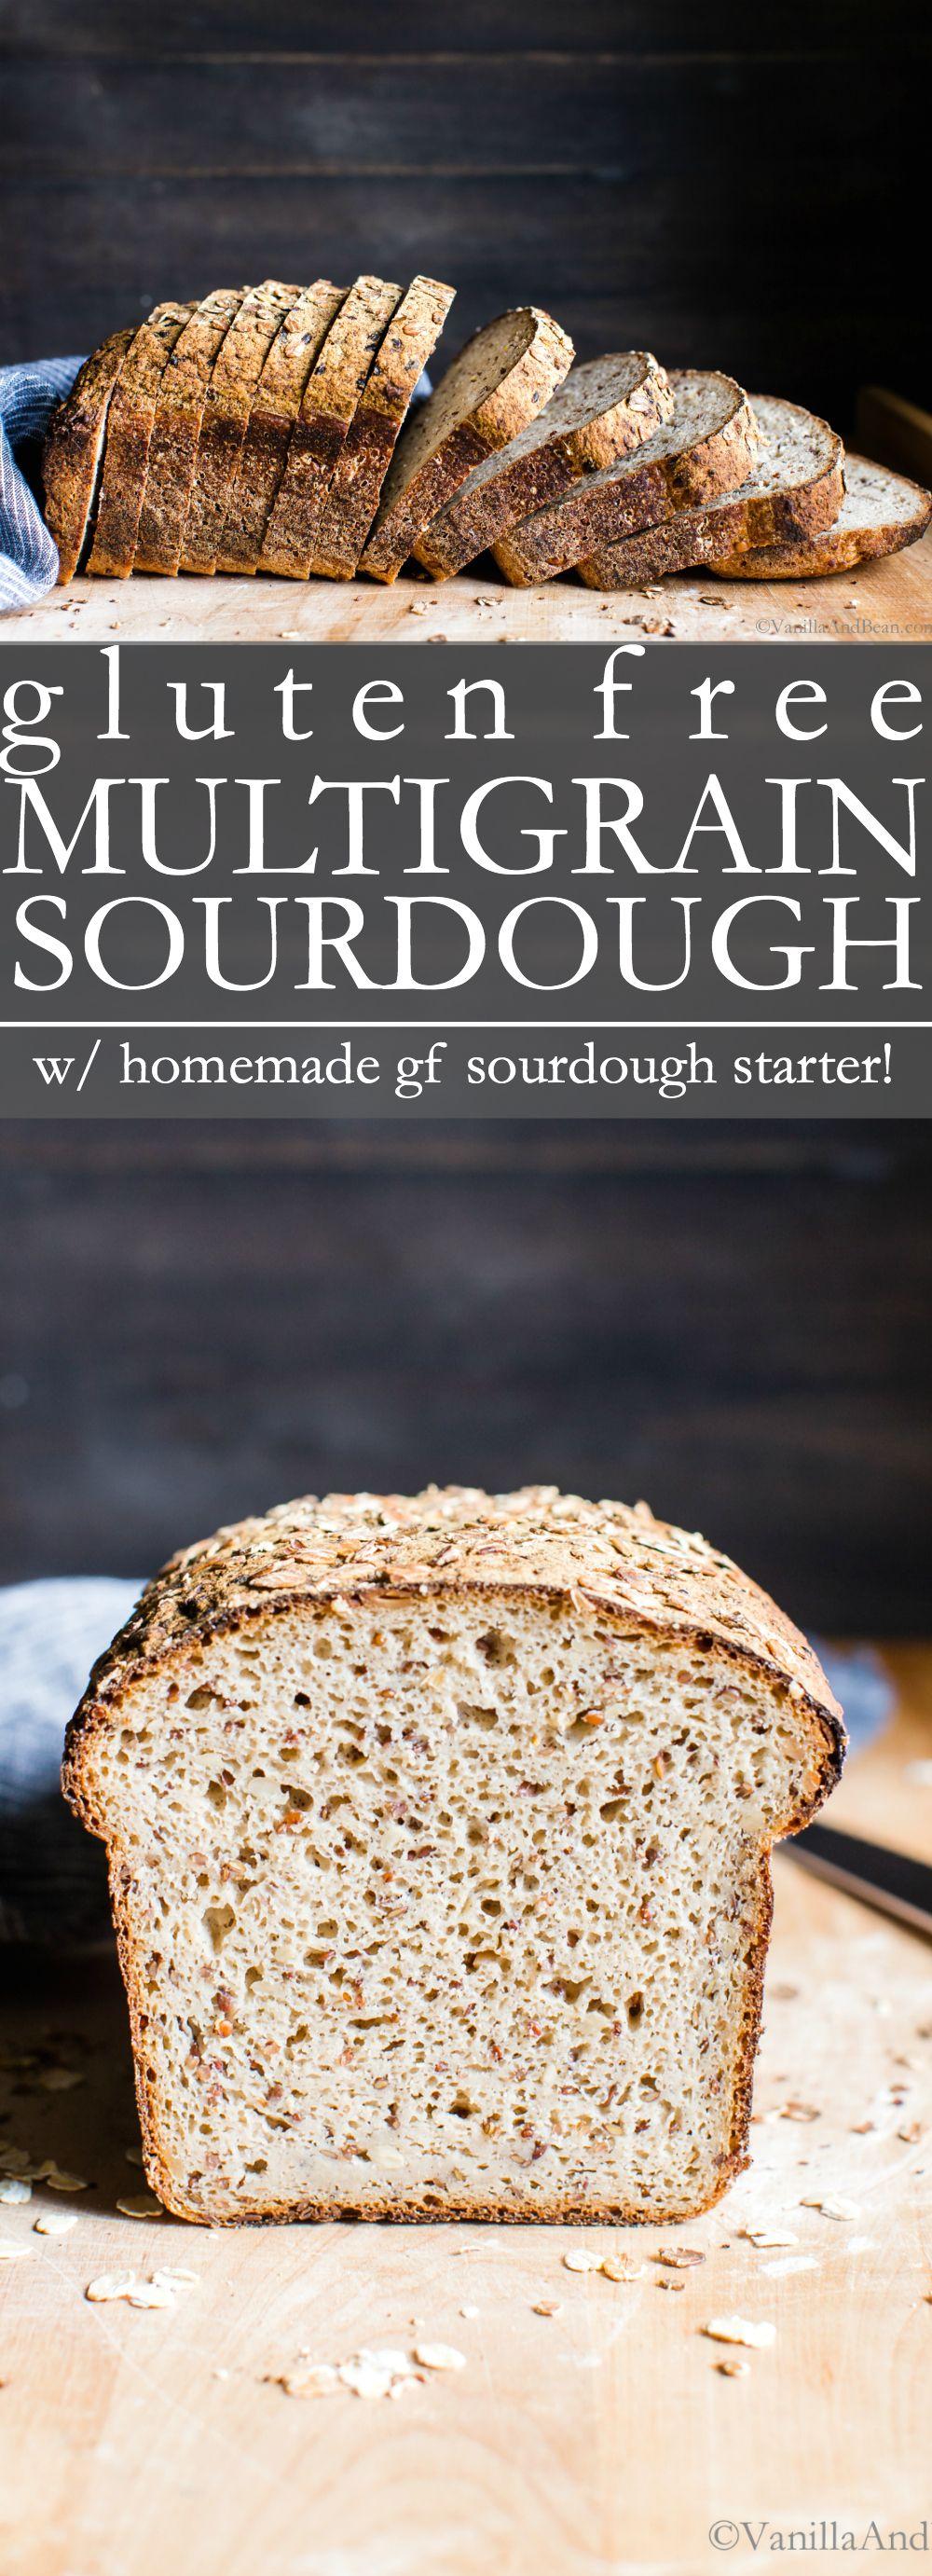 Seeded Multigrain Gluten Free Sourdough Bread Gluten Free Sourdough Bread Gluten Free Sourdough Gluten Free Bread Machine Recipe